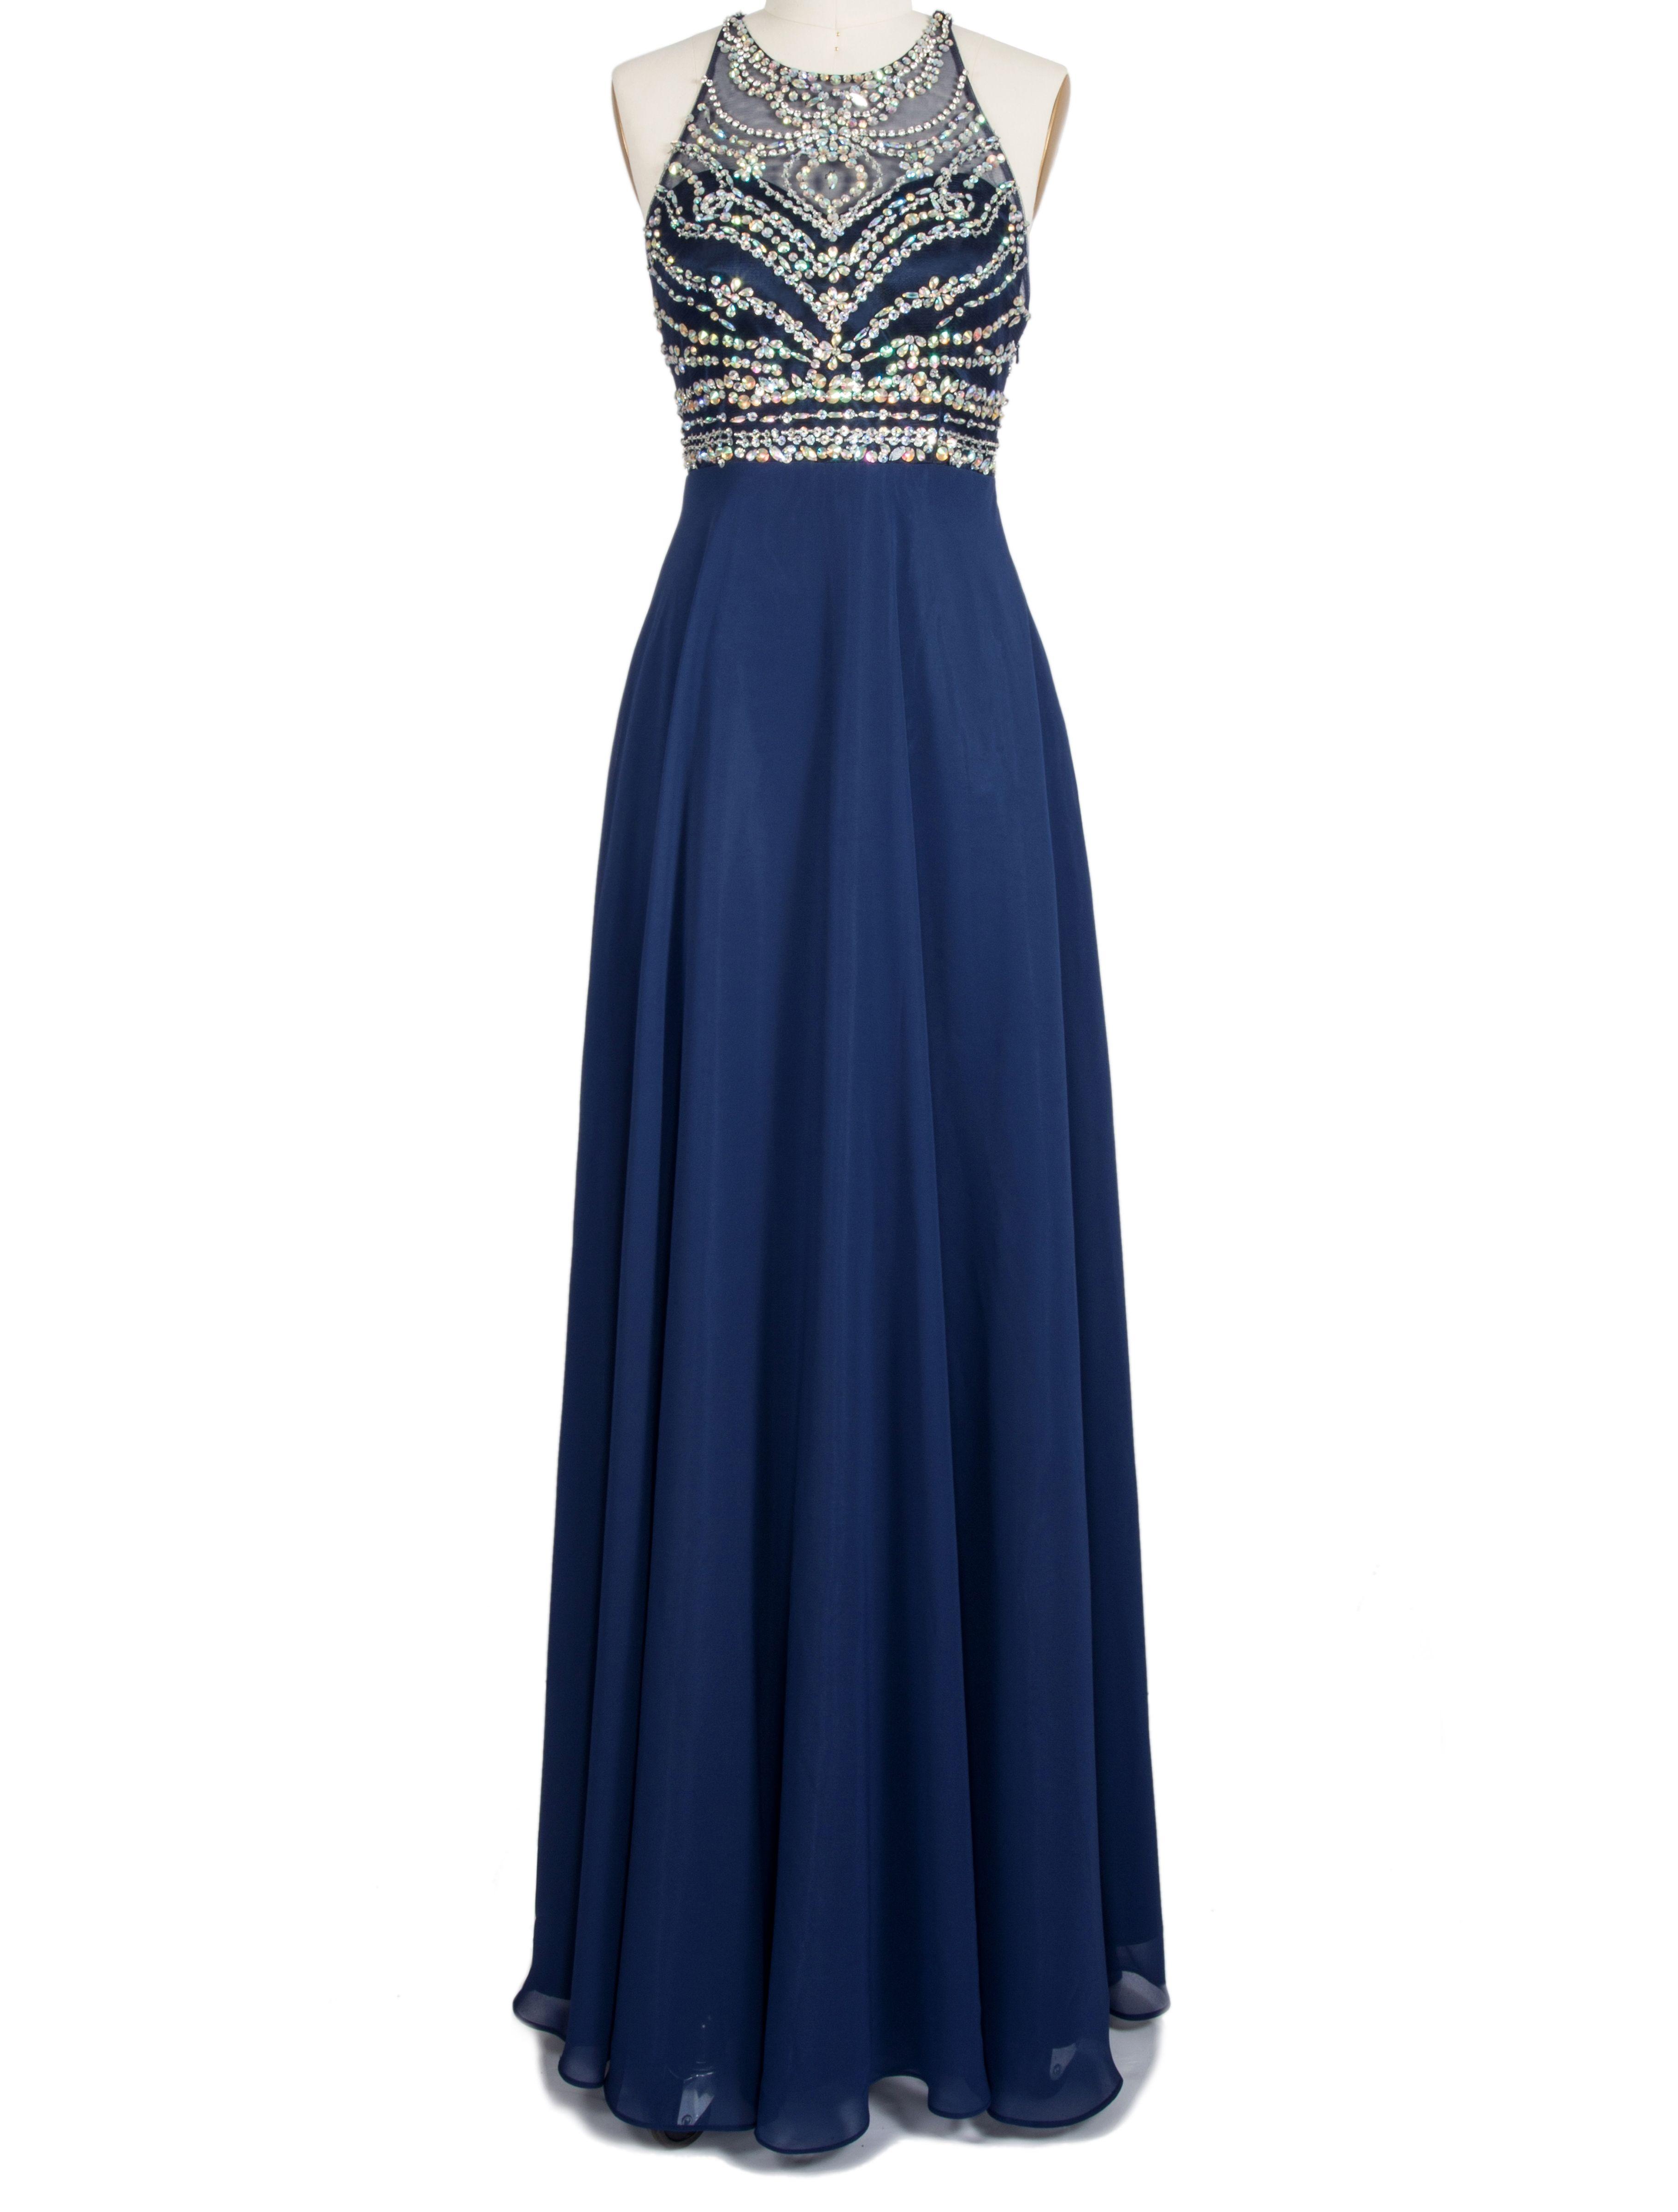 Womenus prom evening dress high neck beading chiffon party ball